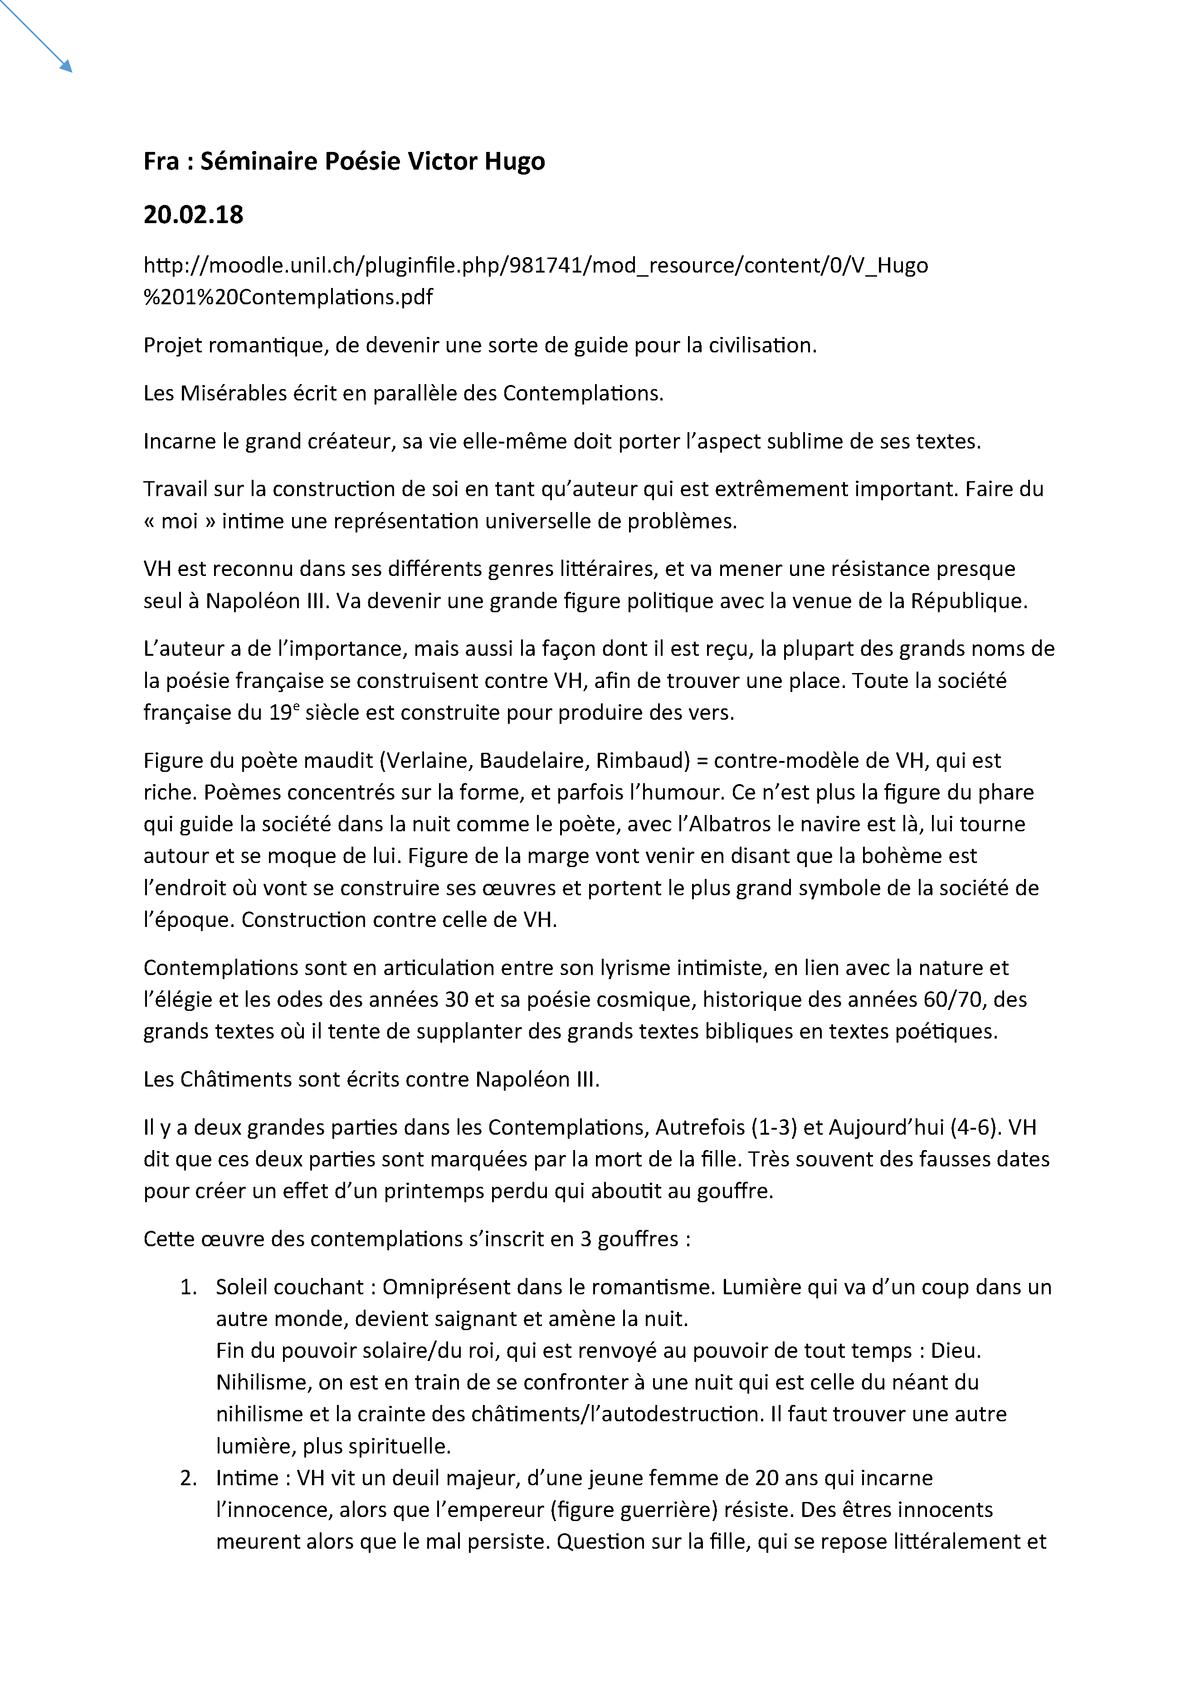 Séminaire Poésie Victor Hugo Unil Studocu